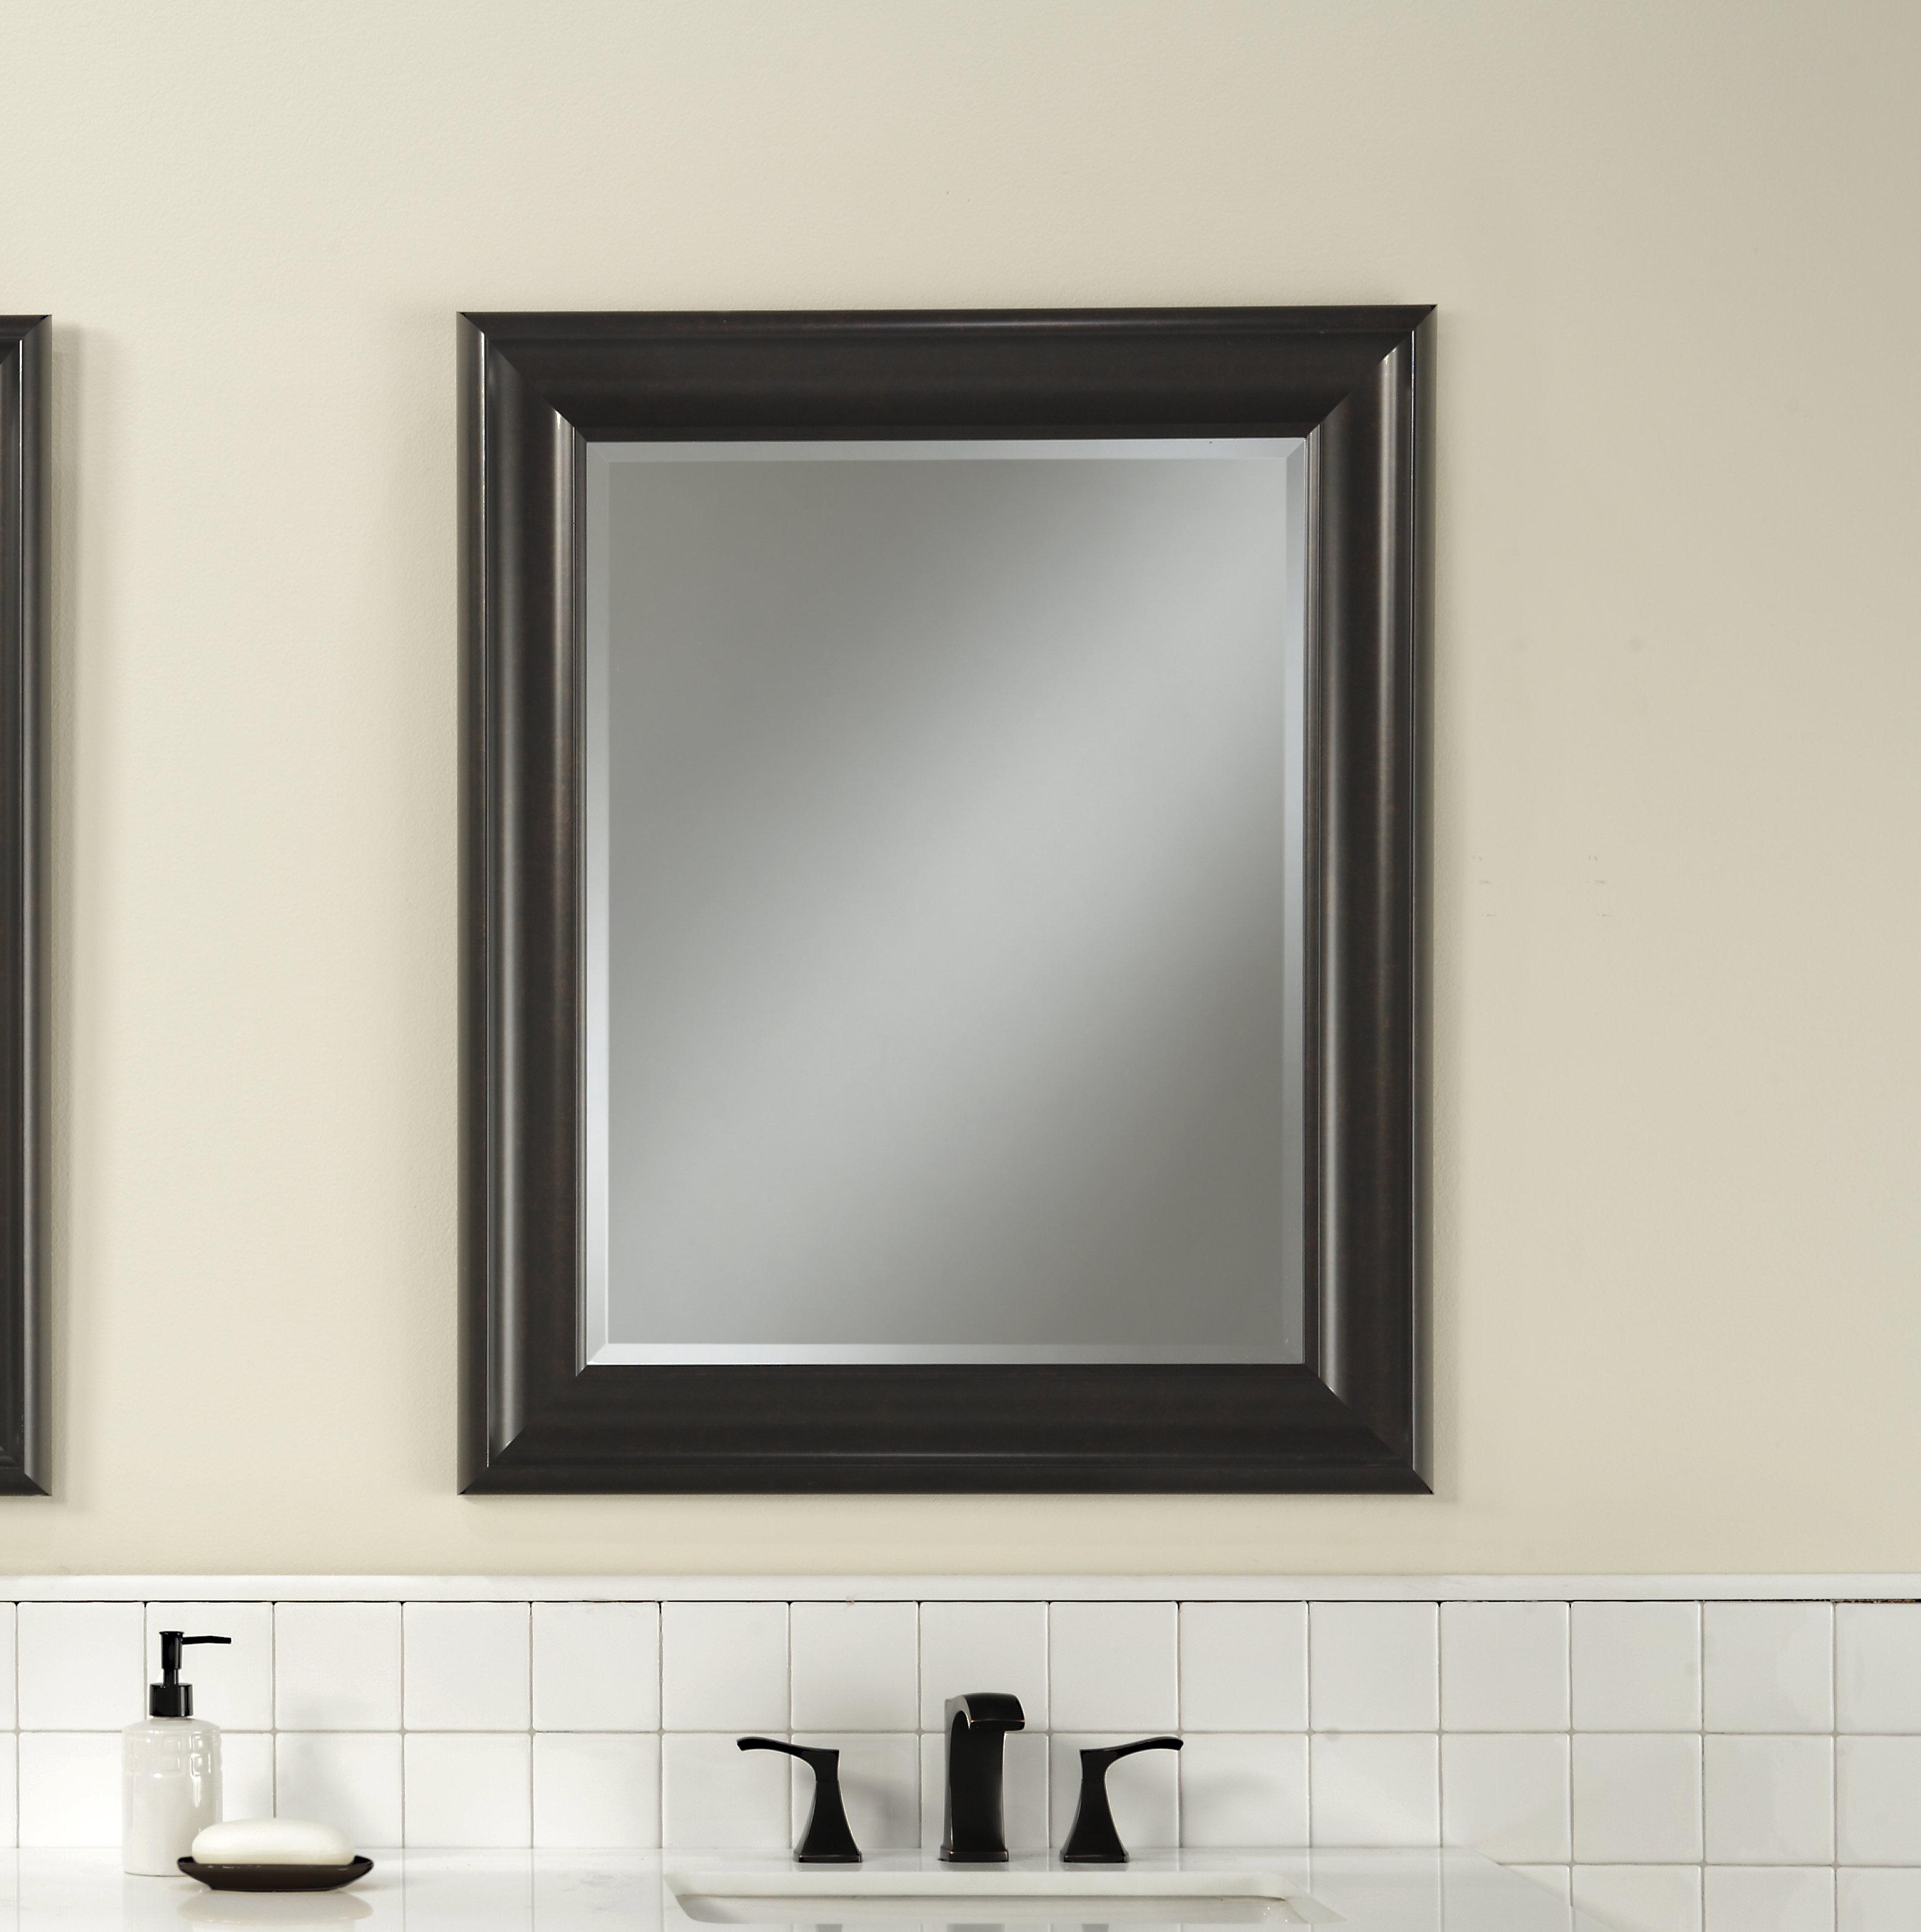 Willa Arlo Interiors Northcutt Accent Mirror   Wayfair For Northcutt Accent Mirrors (View 4 of 30)